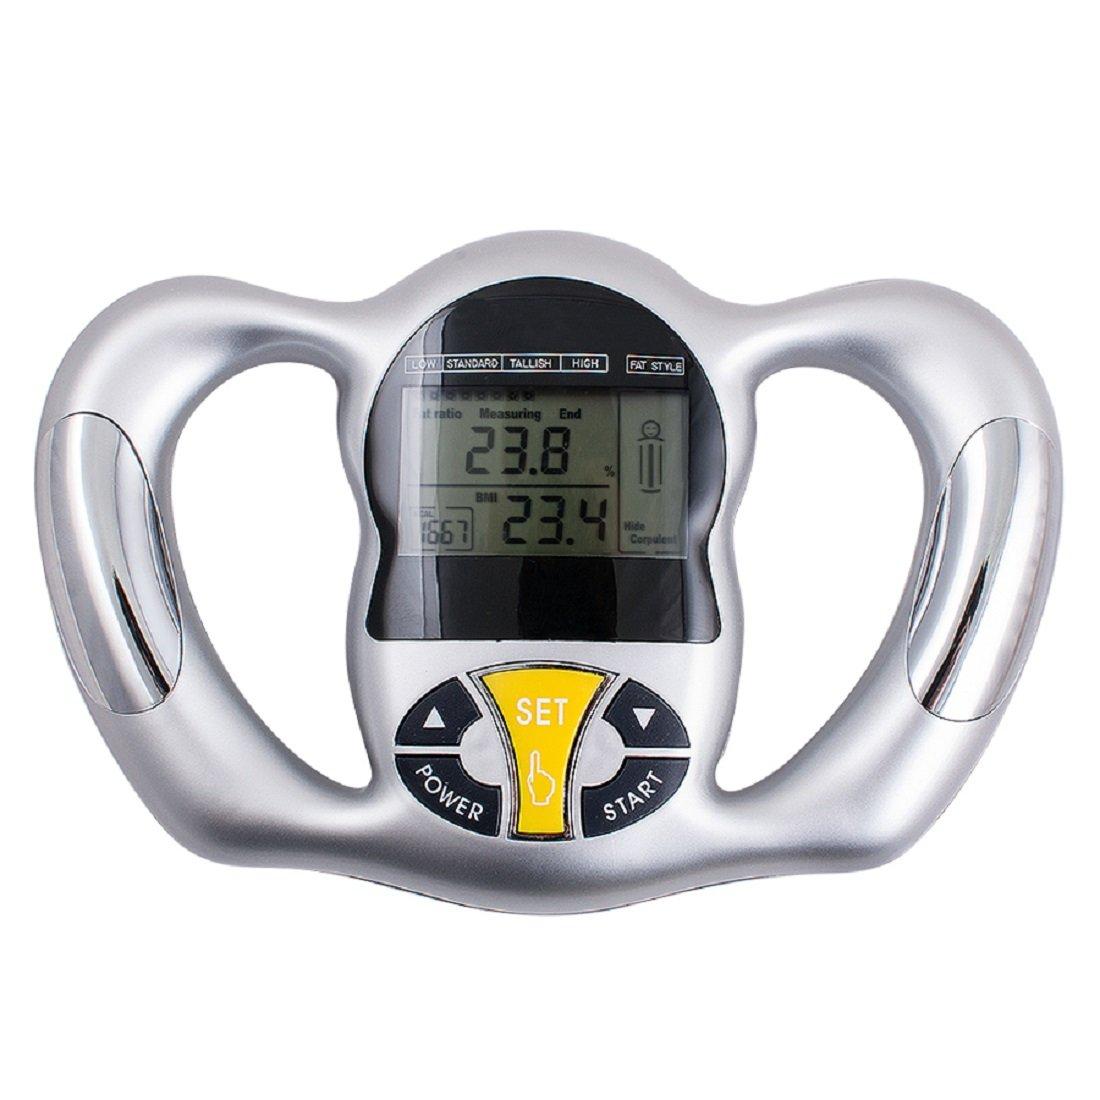 Jinon Portable Hand held Body Mass Index BMI Health Fat Analyzer Health Monitor Body Tape Silver